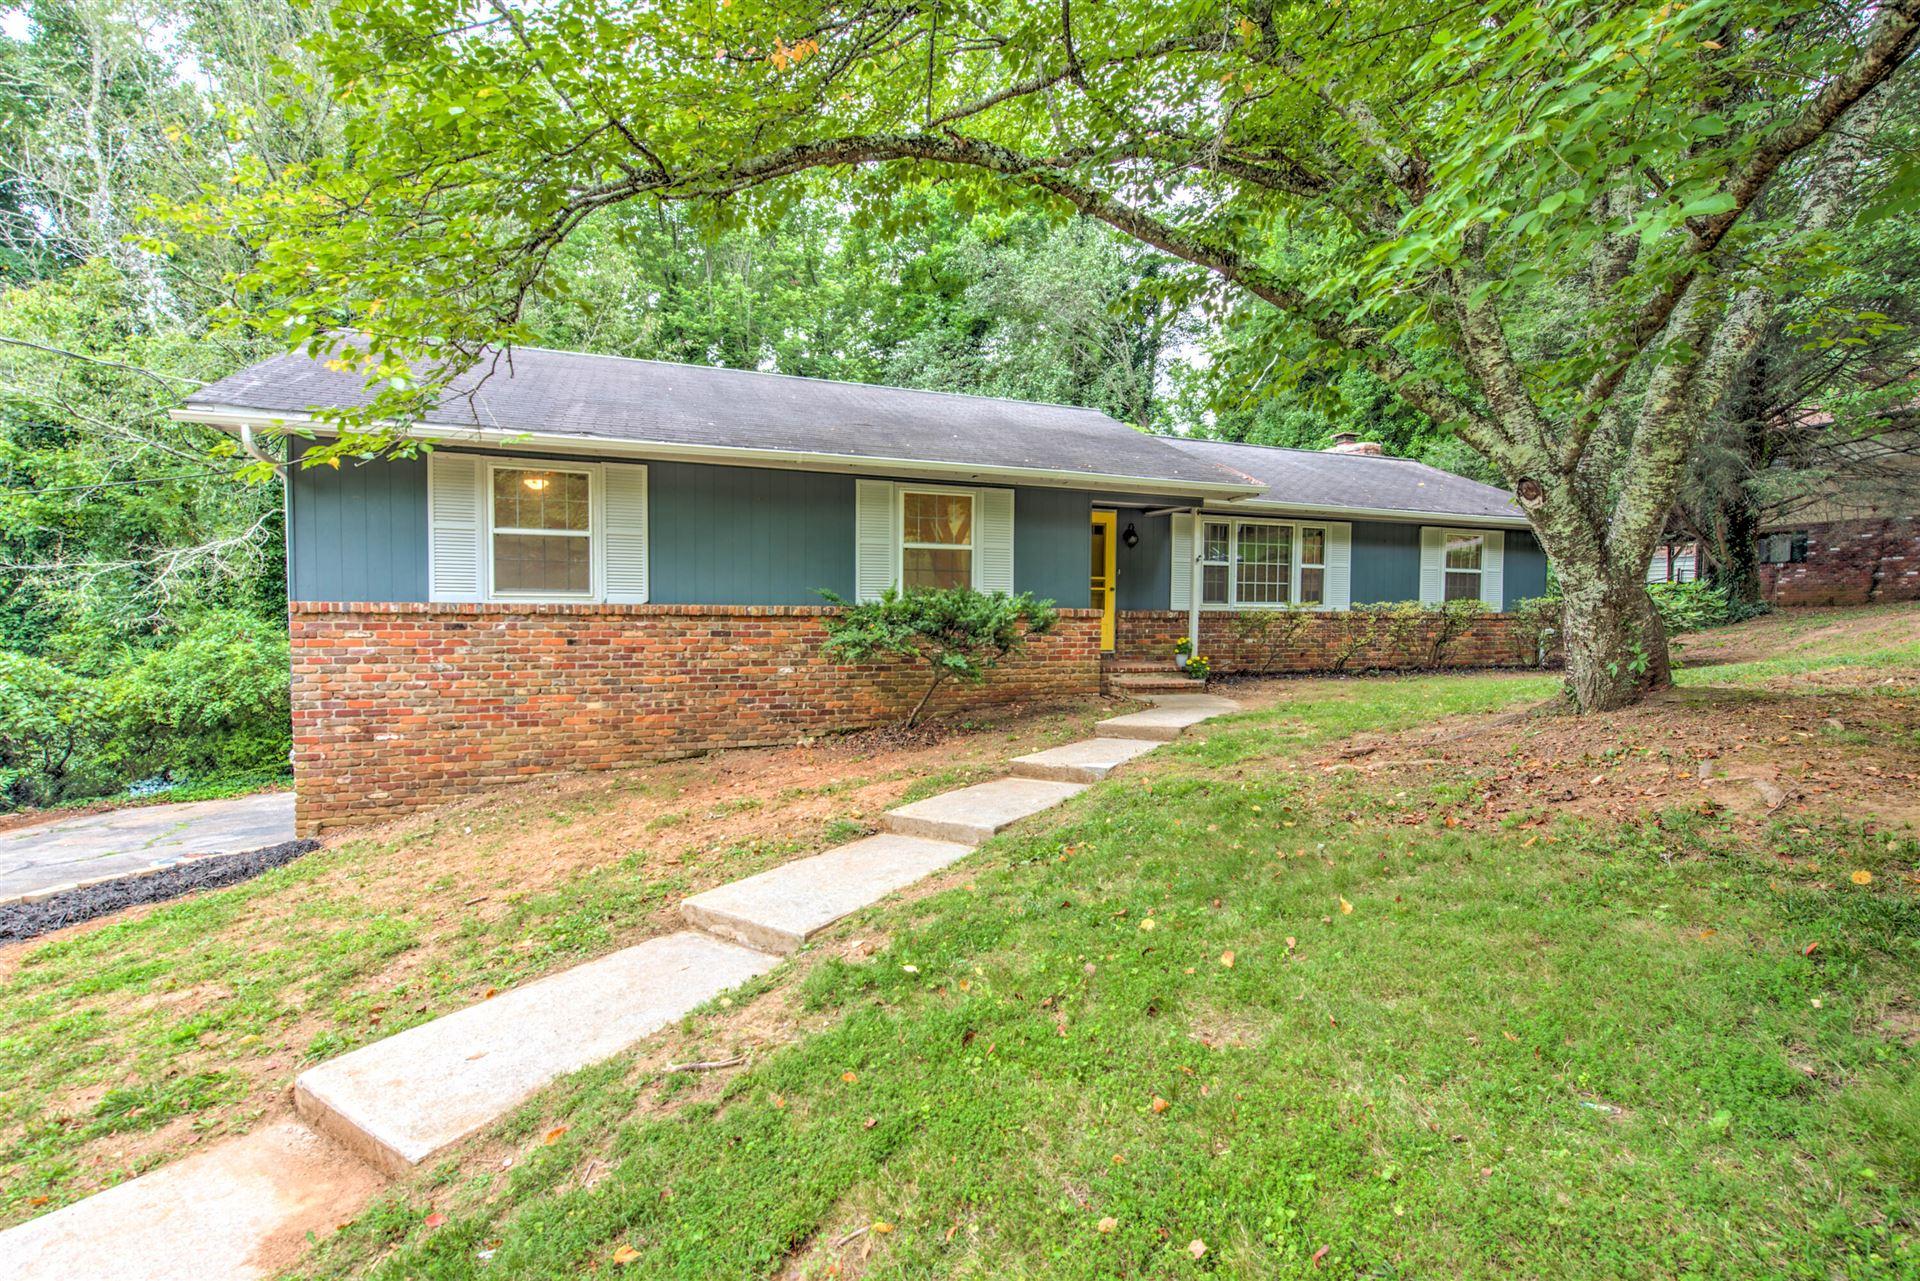 Photo of 119 Newridge Rd, Oak Ridge, TN 37830 (MLS # 1161875)